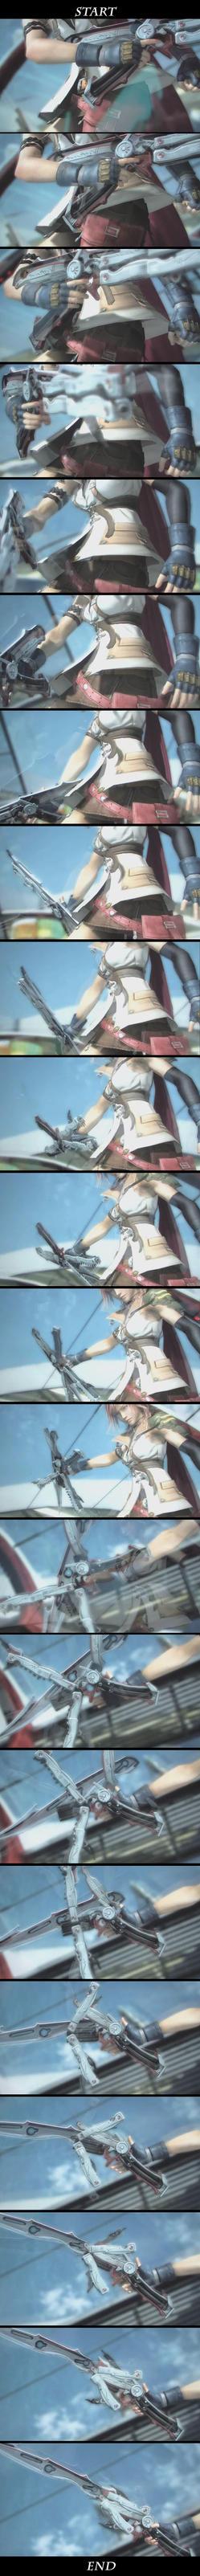 FFXIII Sword Transformation by Laitz